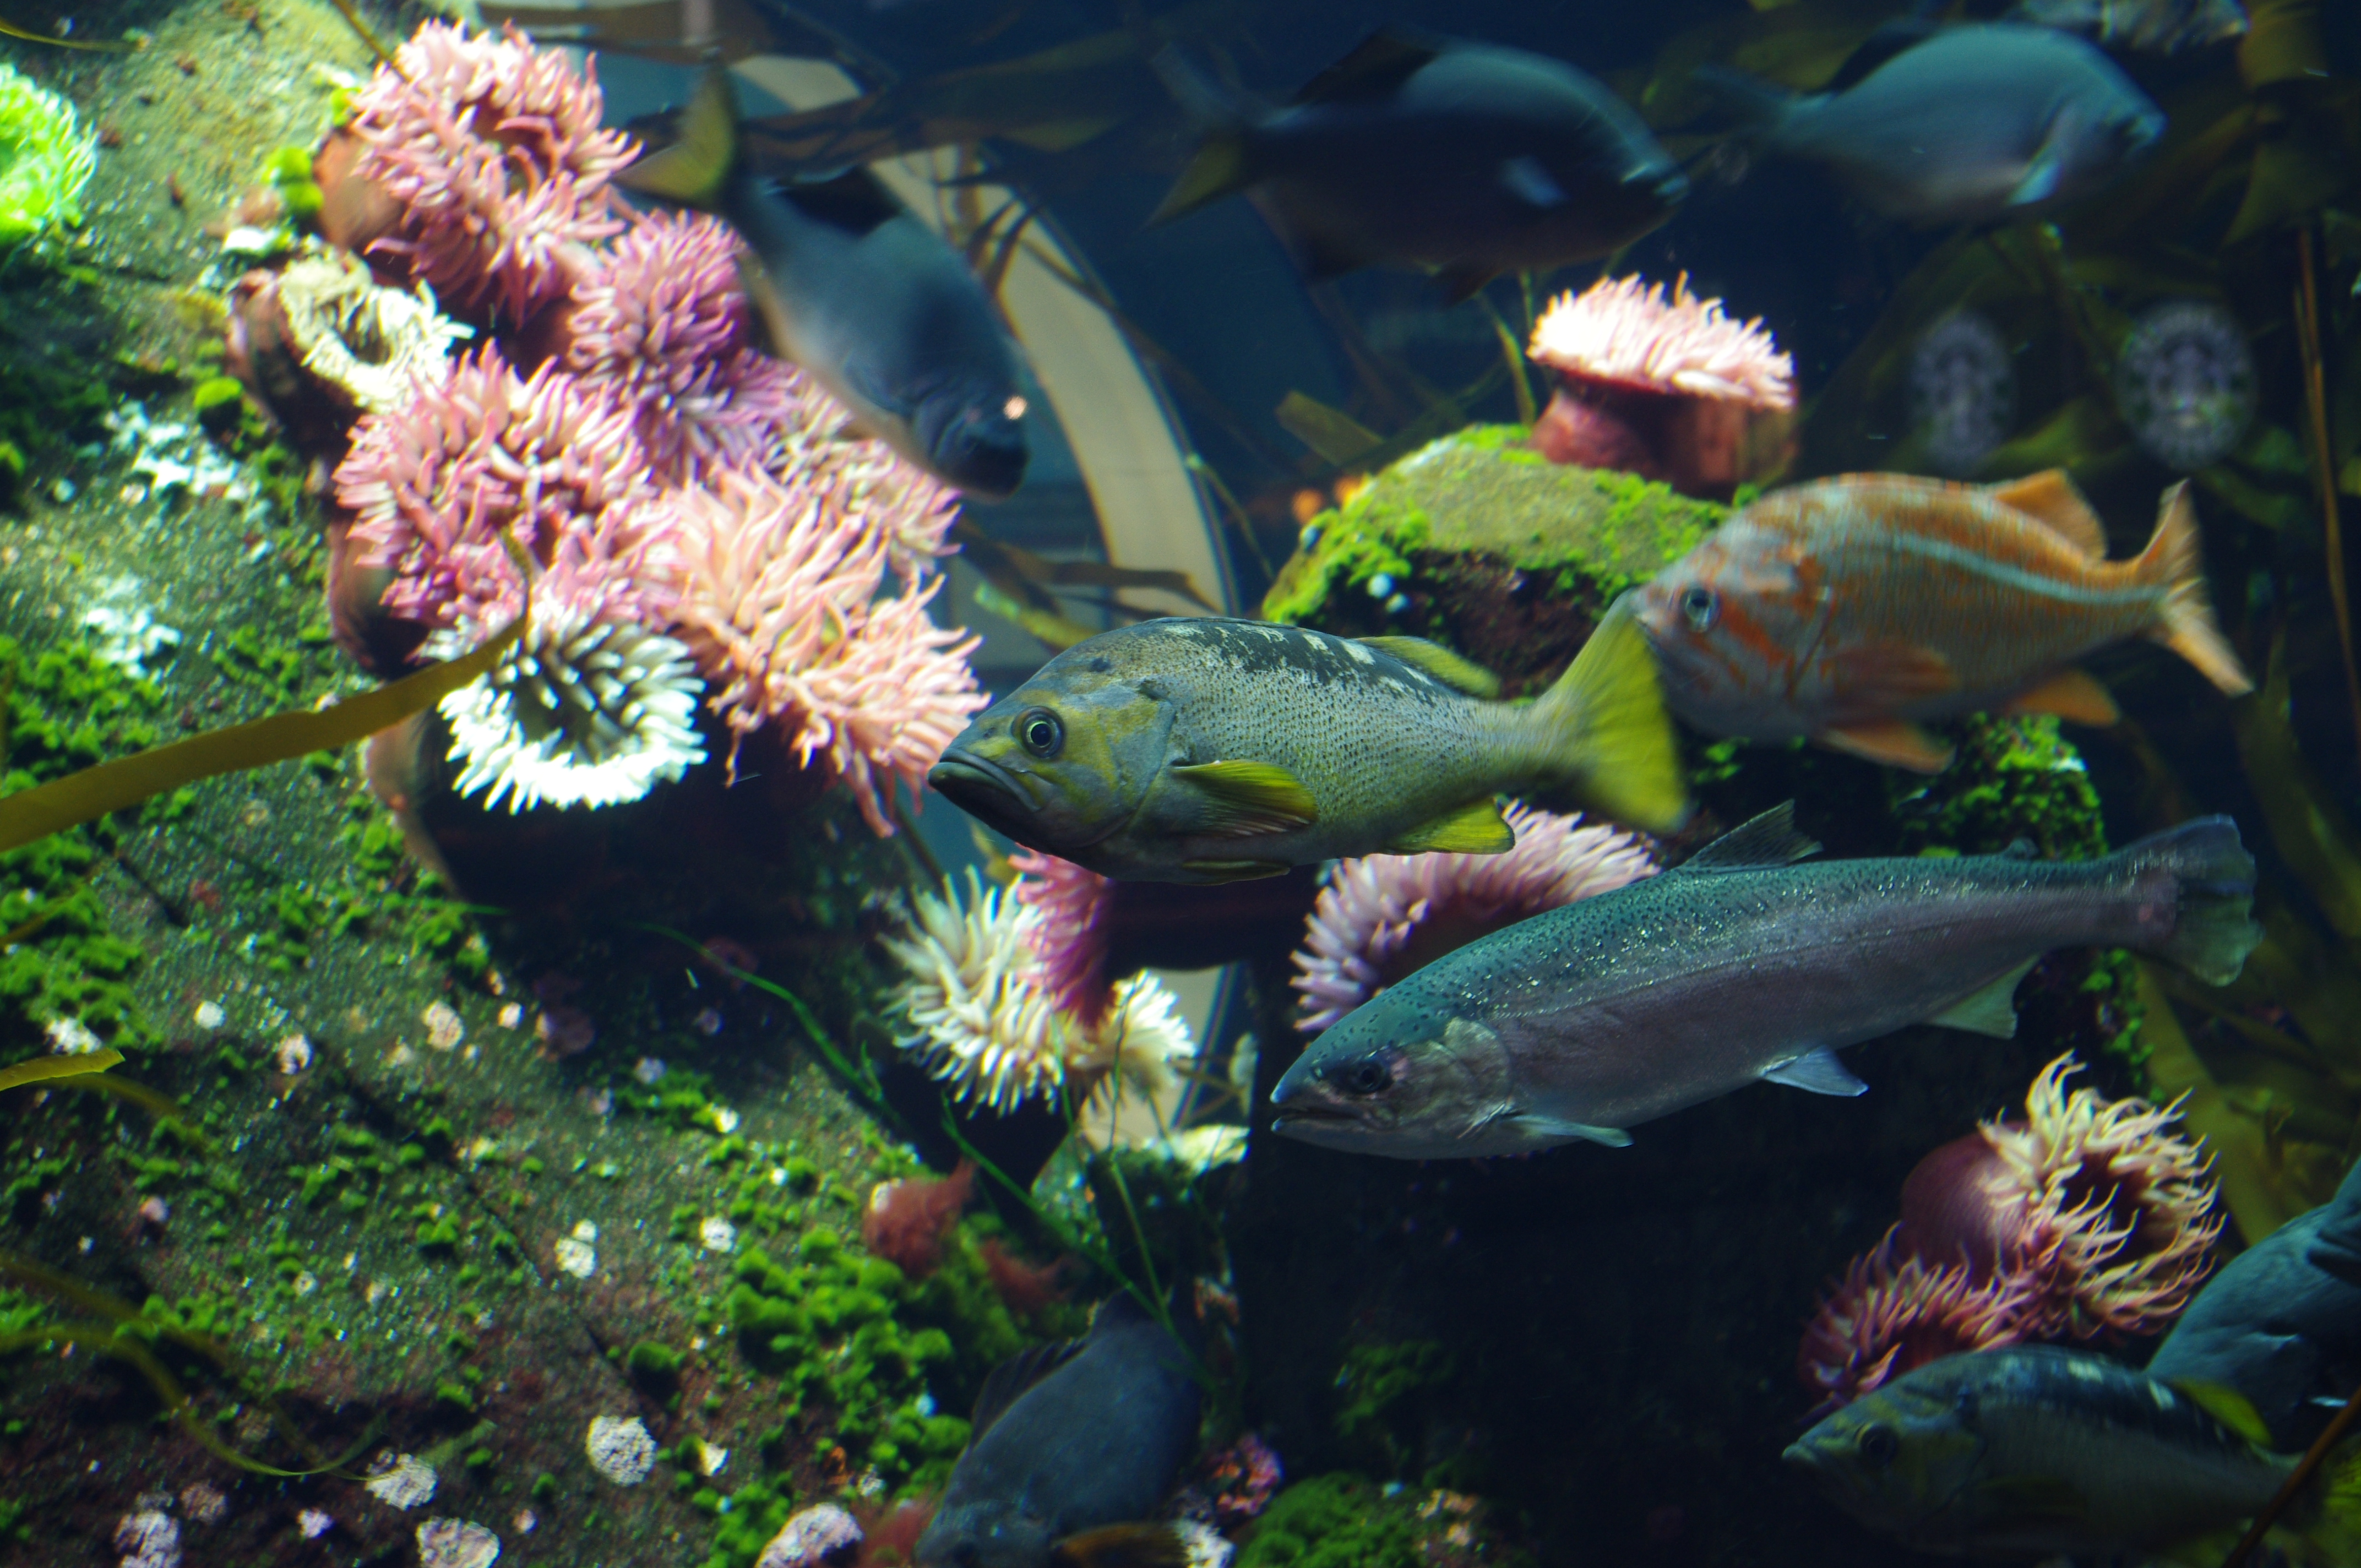 Freshwater aquarium fish vancouver - File Vancouver International Airport Aquarium 2 Jpg